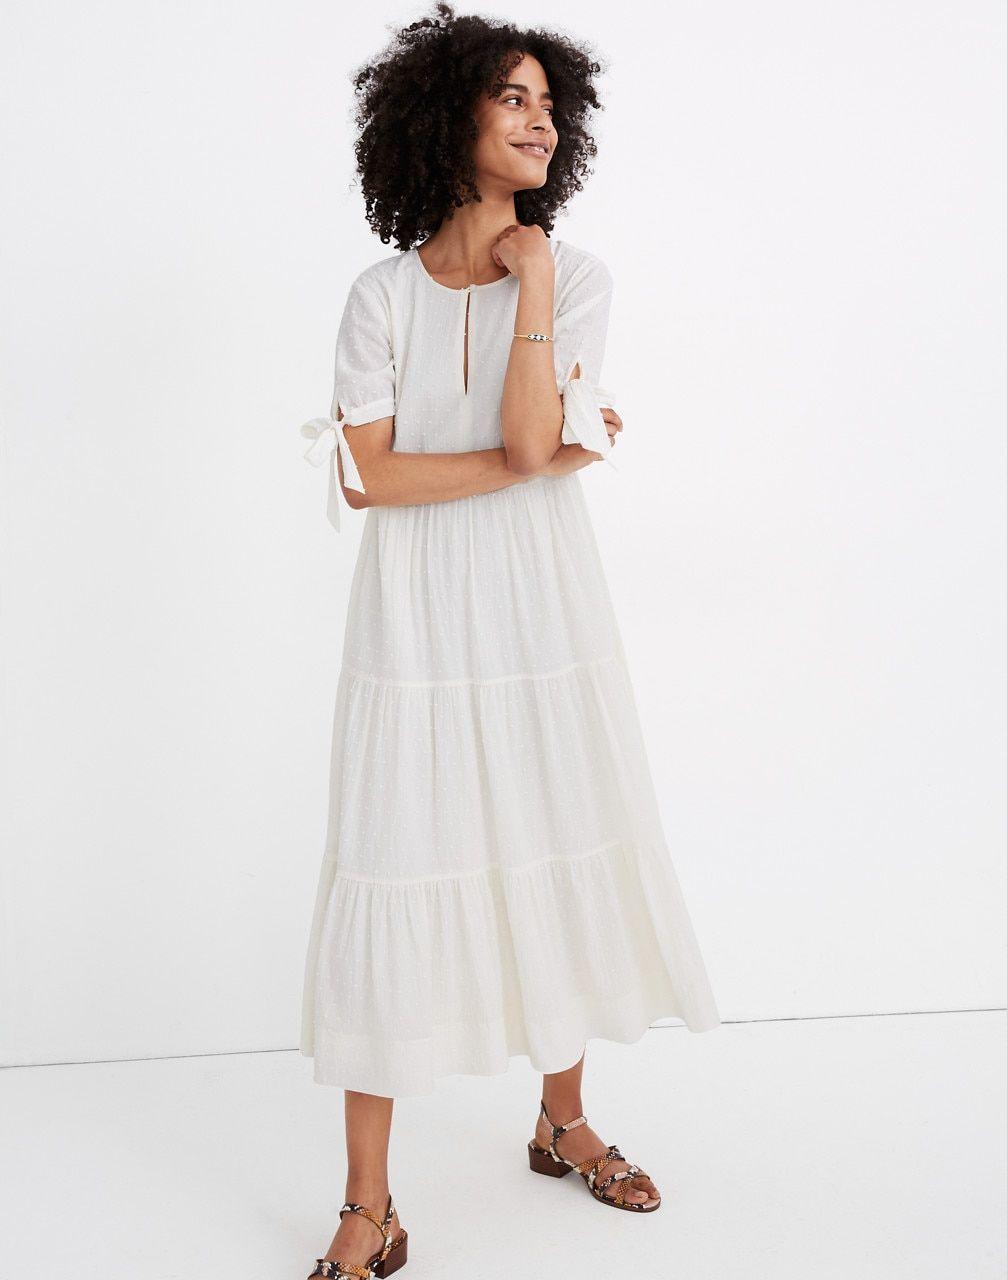 Petite Tie Sleeve Tiered Midi Dress In Swiss Dot In 2021 Tiered Midi Dress Midi Dress Dresses [ 1280 x 1007 Pixel ]